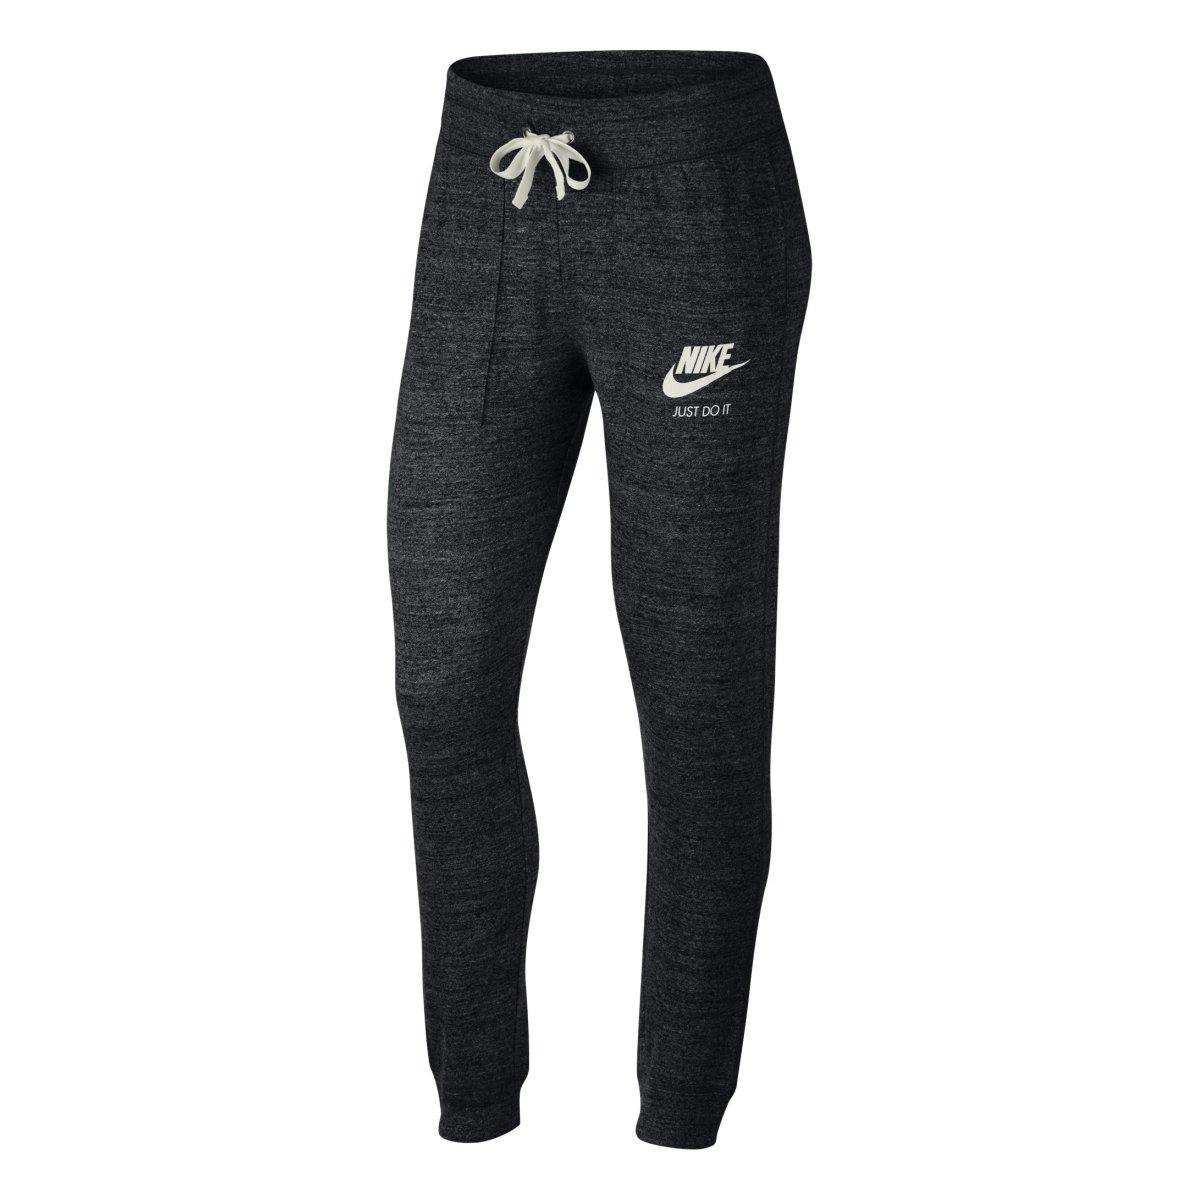 Nike Sportswear Vintage Pants Damen Jogginghose Freizeithose Fitness